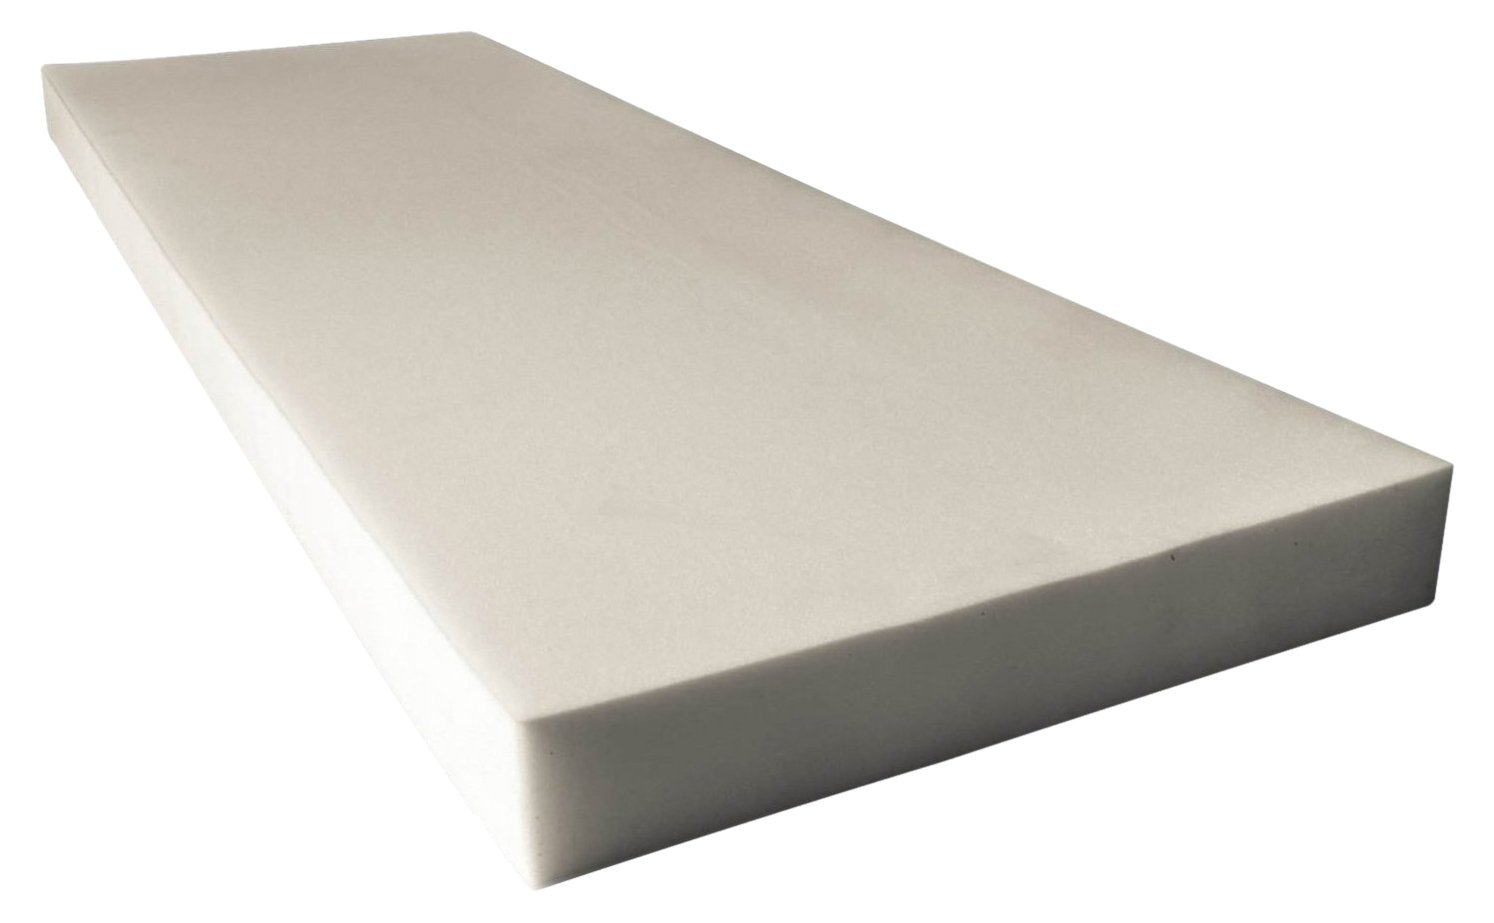 AK TRADING Upholstery Foam High Density Cushion (Seat Replacement, Foam Sheet, Foam Padding), 1